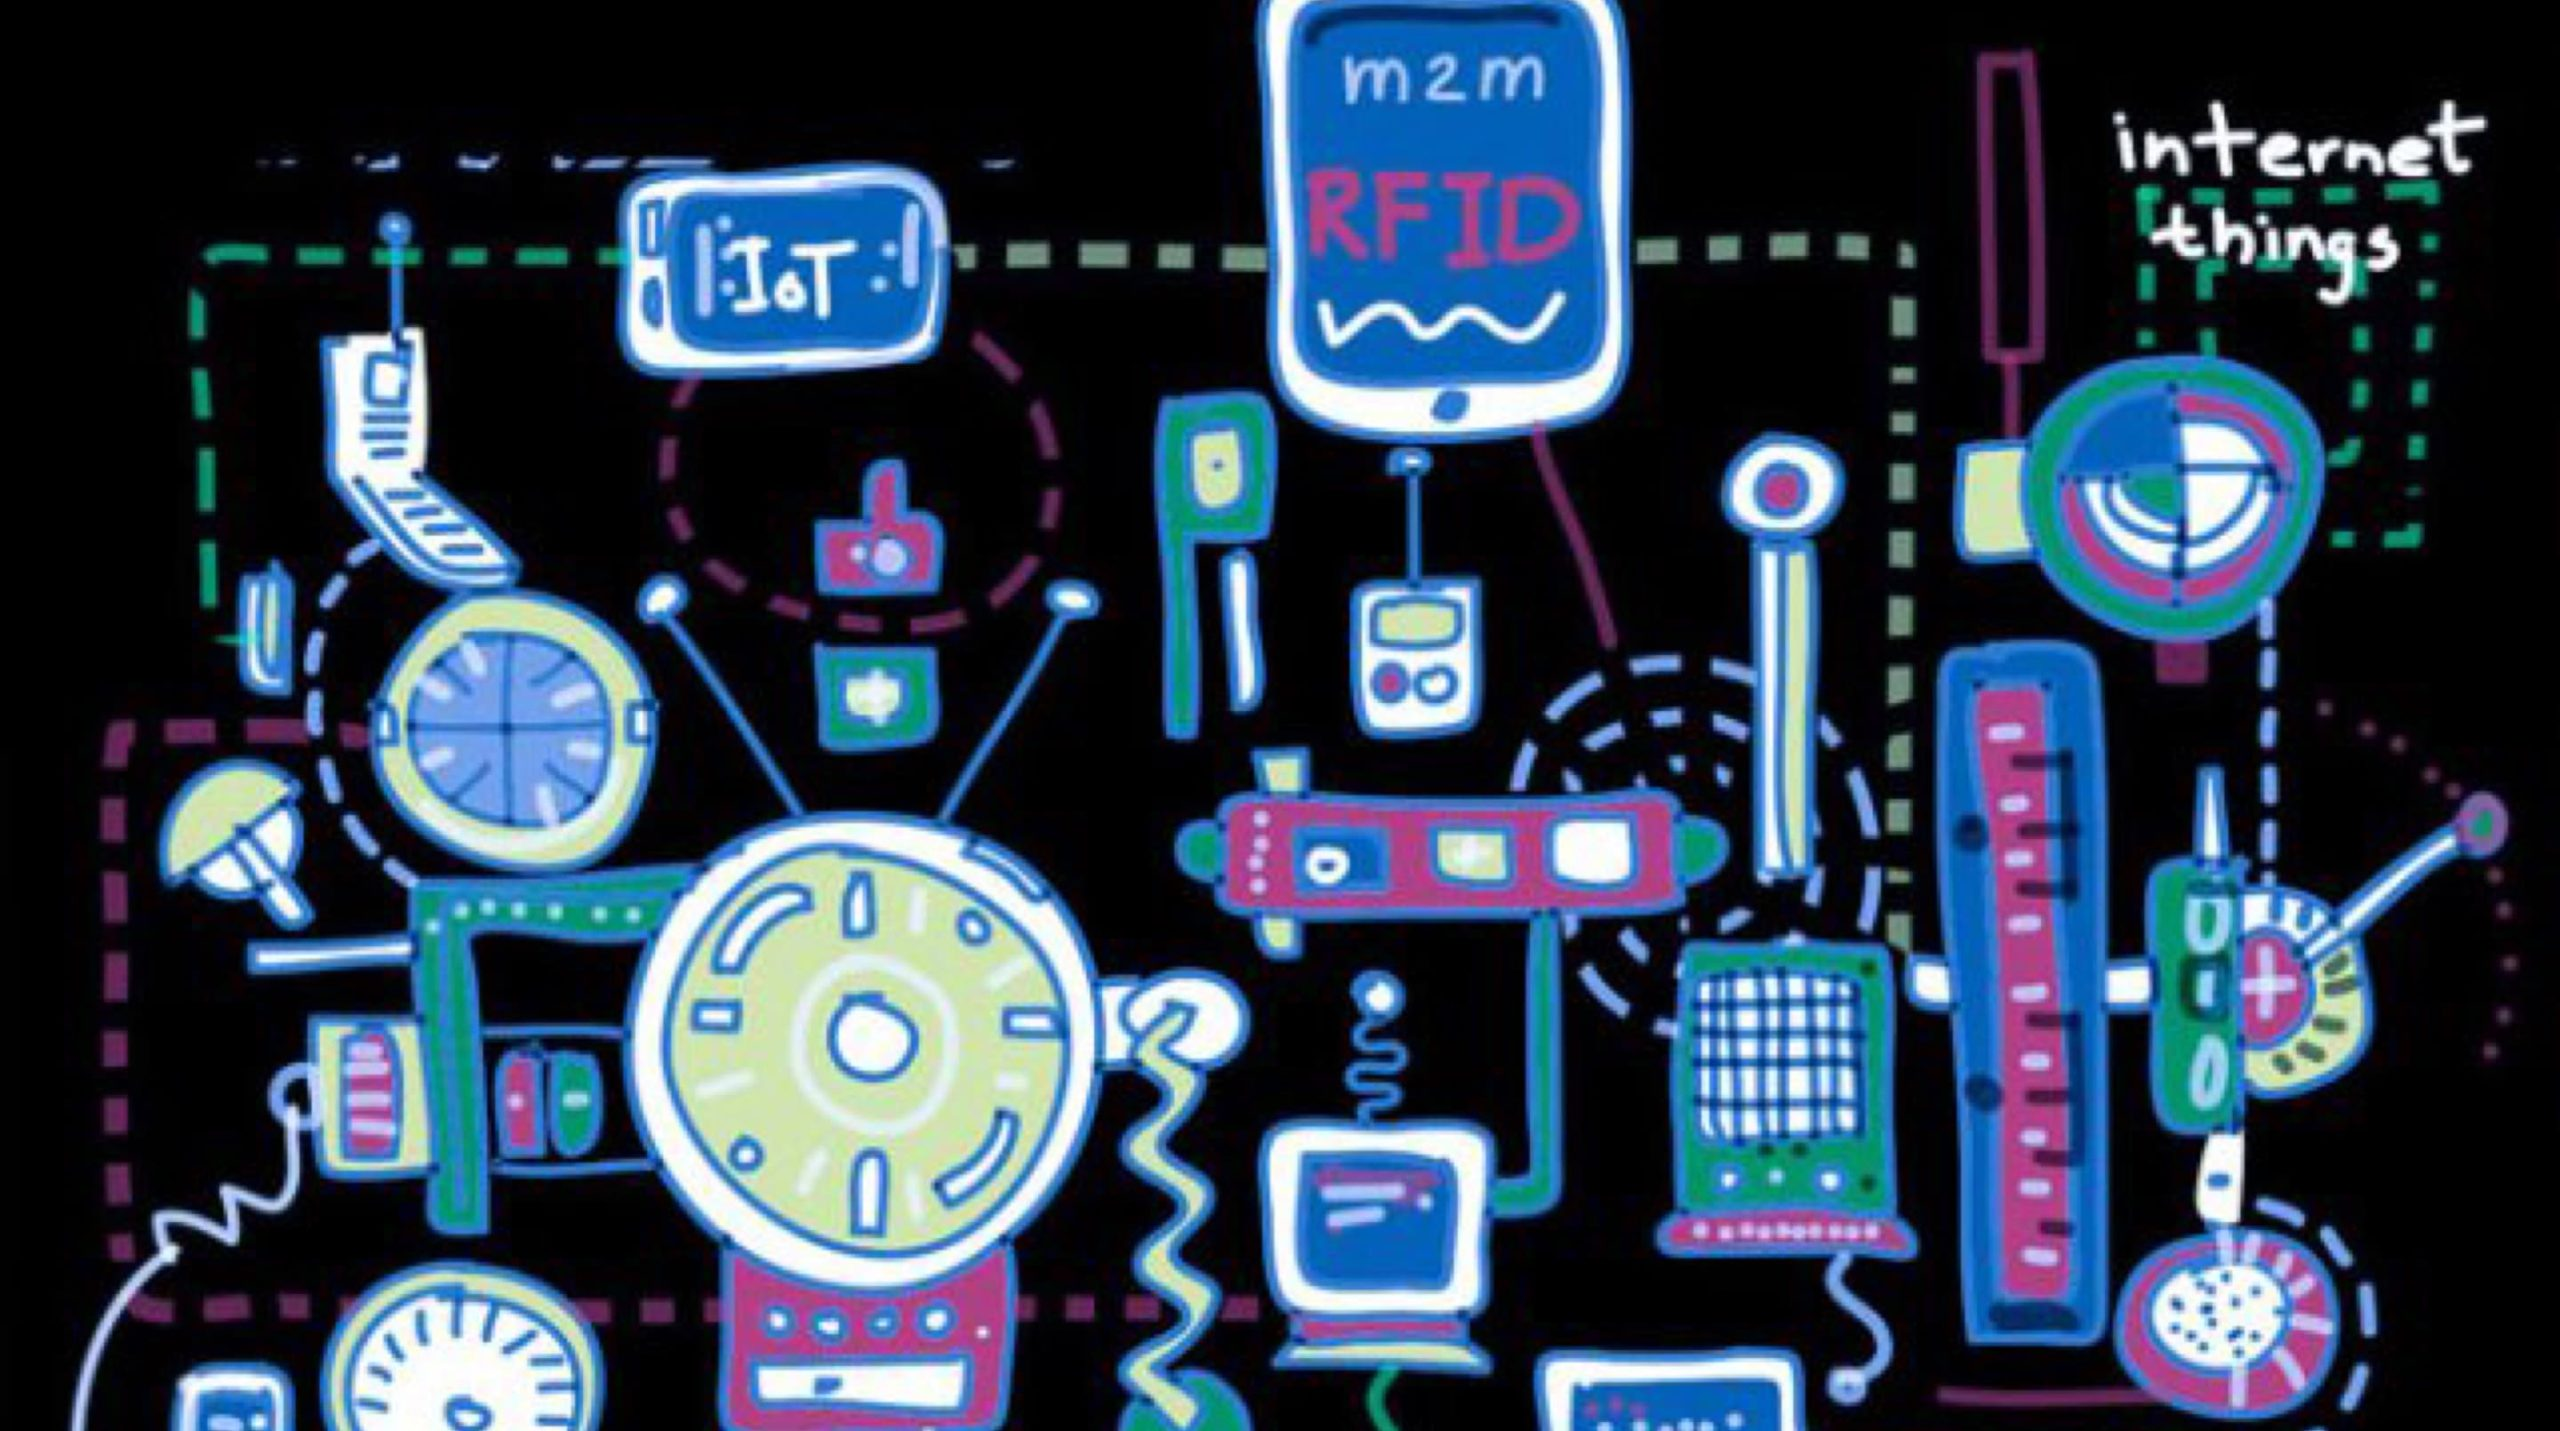 blog-banner-Part-1-IoT-Platforms-Common-Building-Blocks-Key-Differentiators